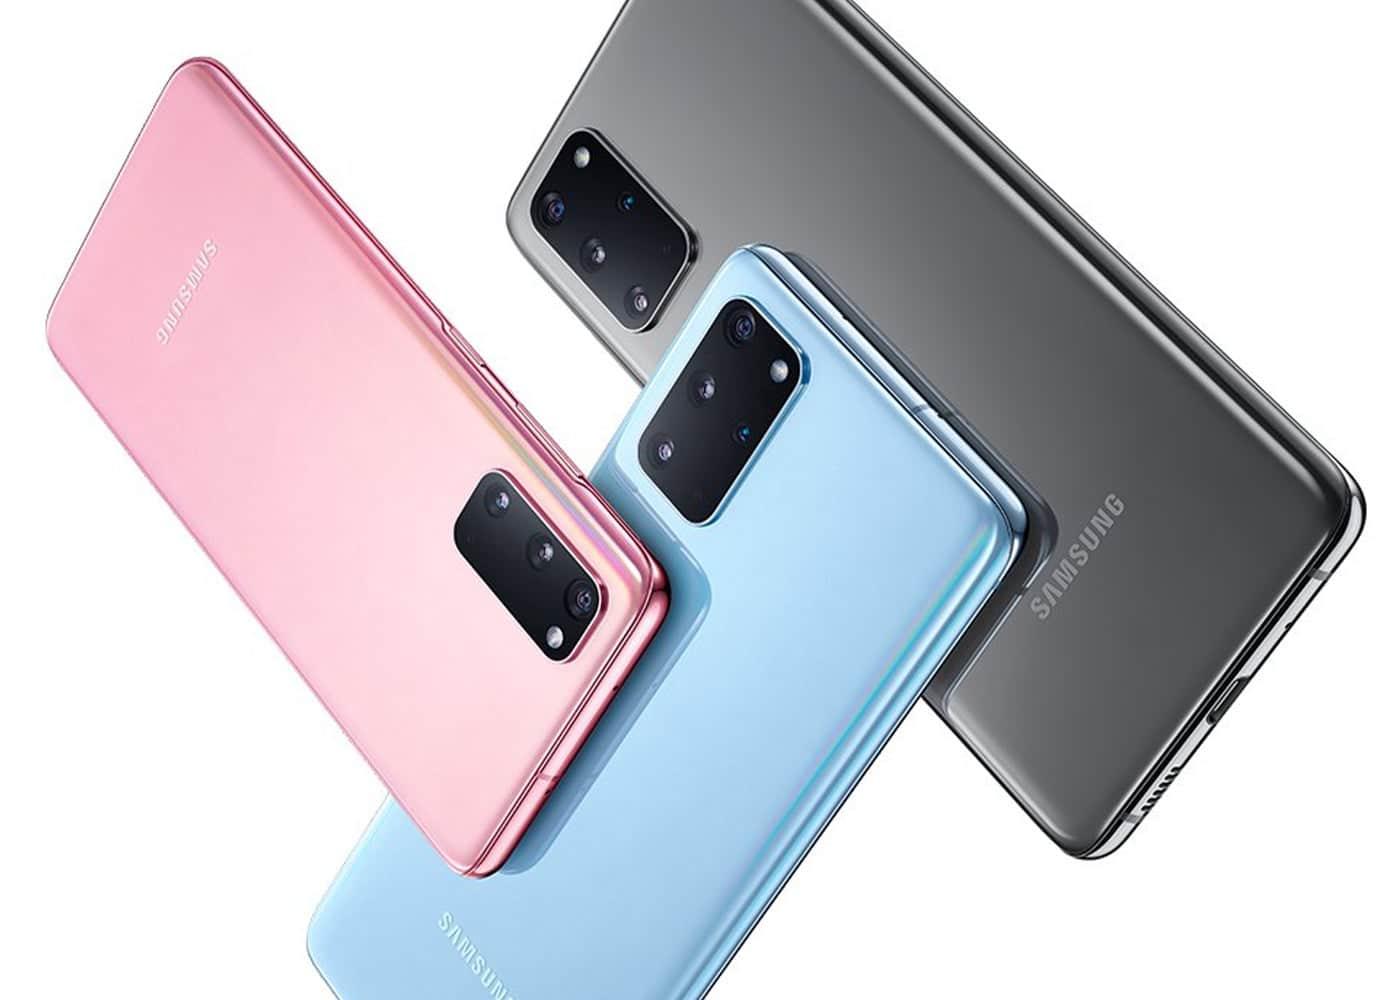 samsung قد تطلق هاتف جالكسي نوت 20 مع معالج إكسينوس 922